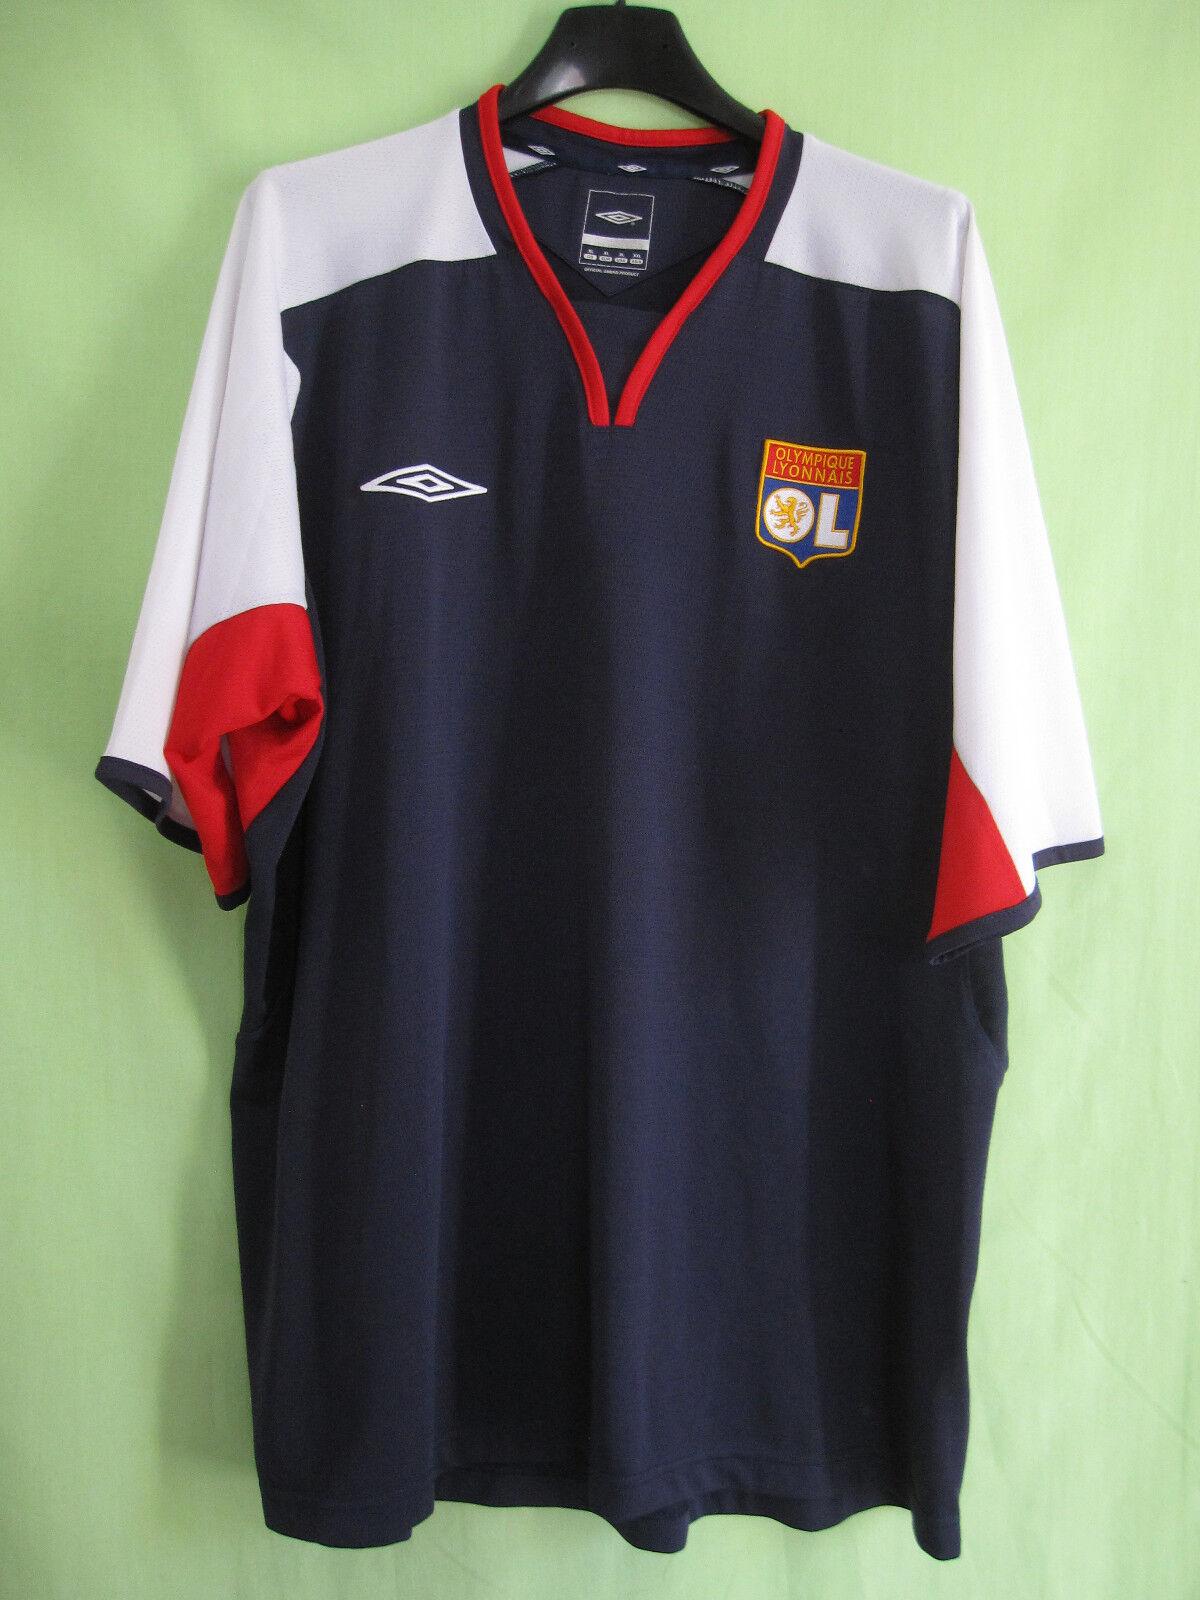 Maillot Olympique Lyonnais OL Lyon Entrainement Umbro vintage Shirt - XL